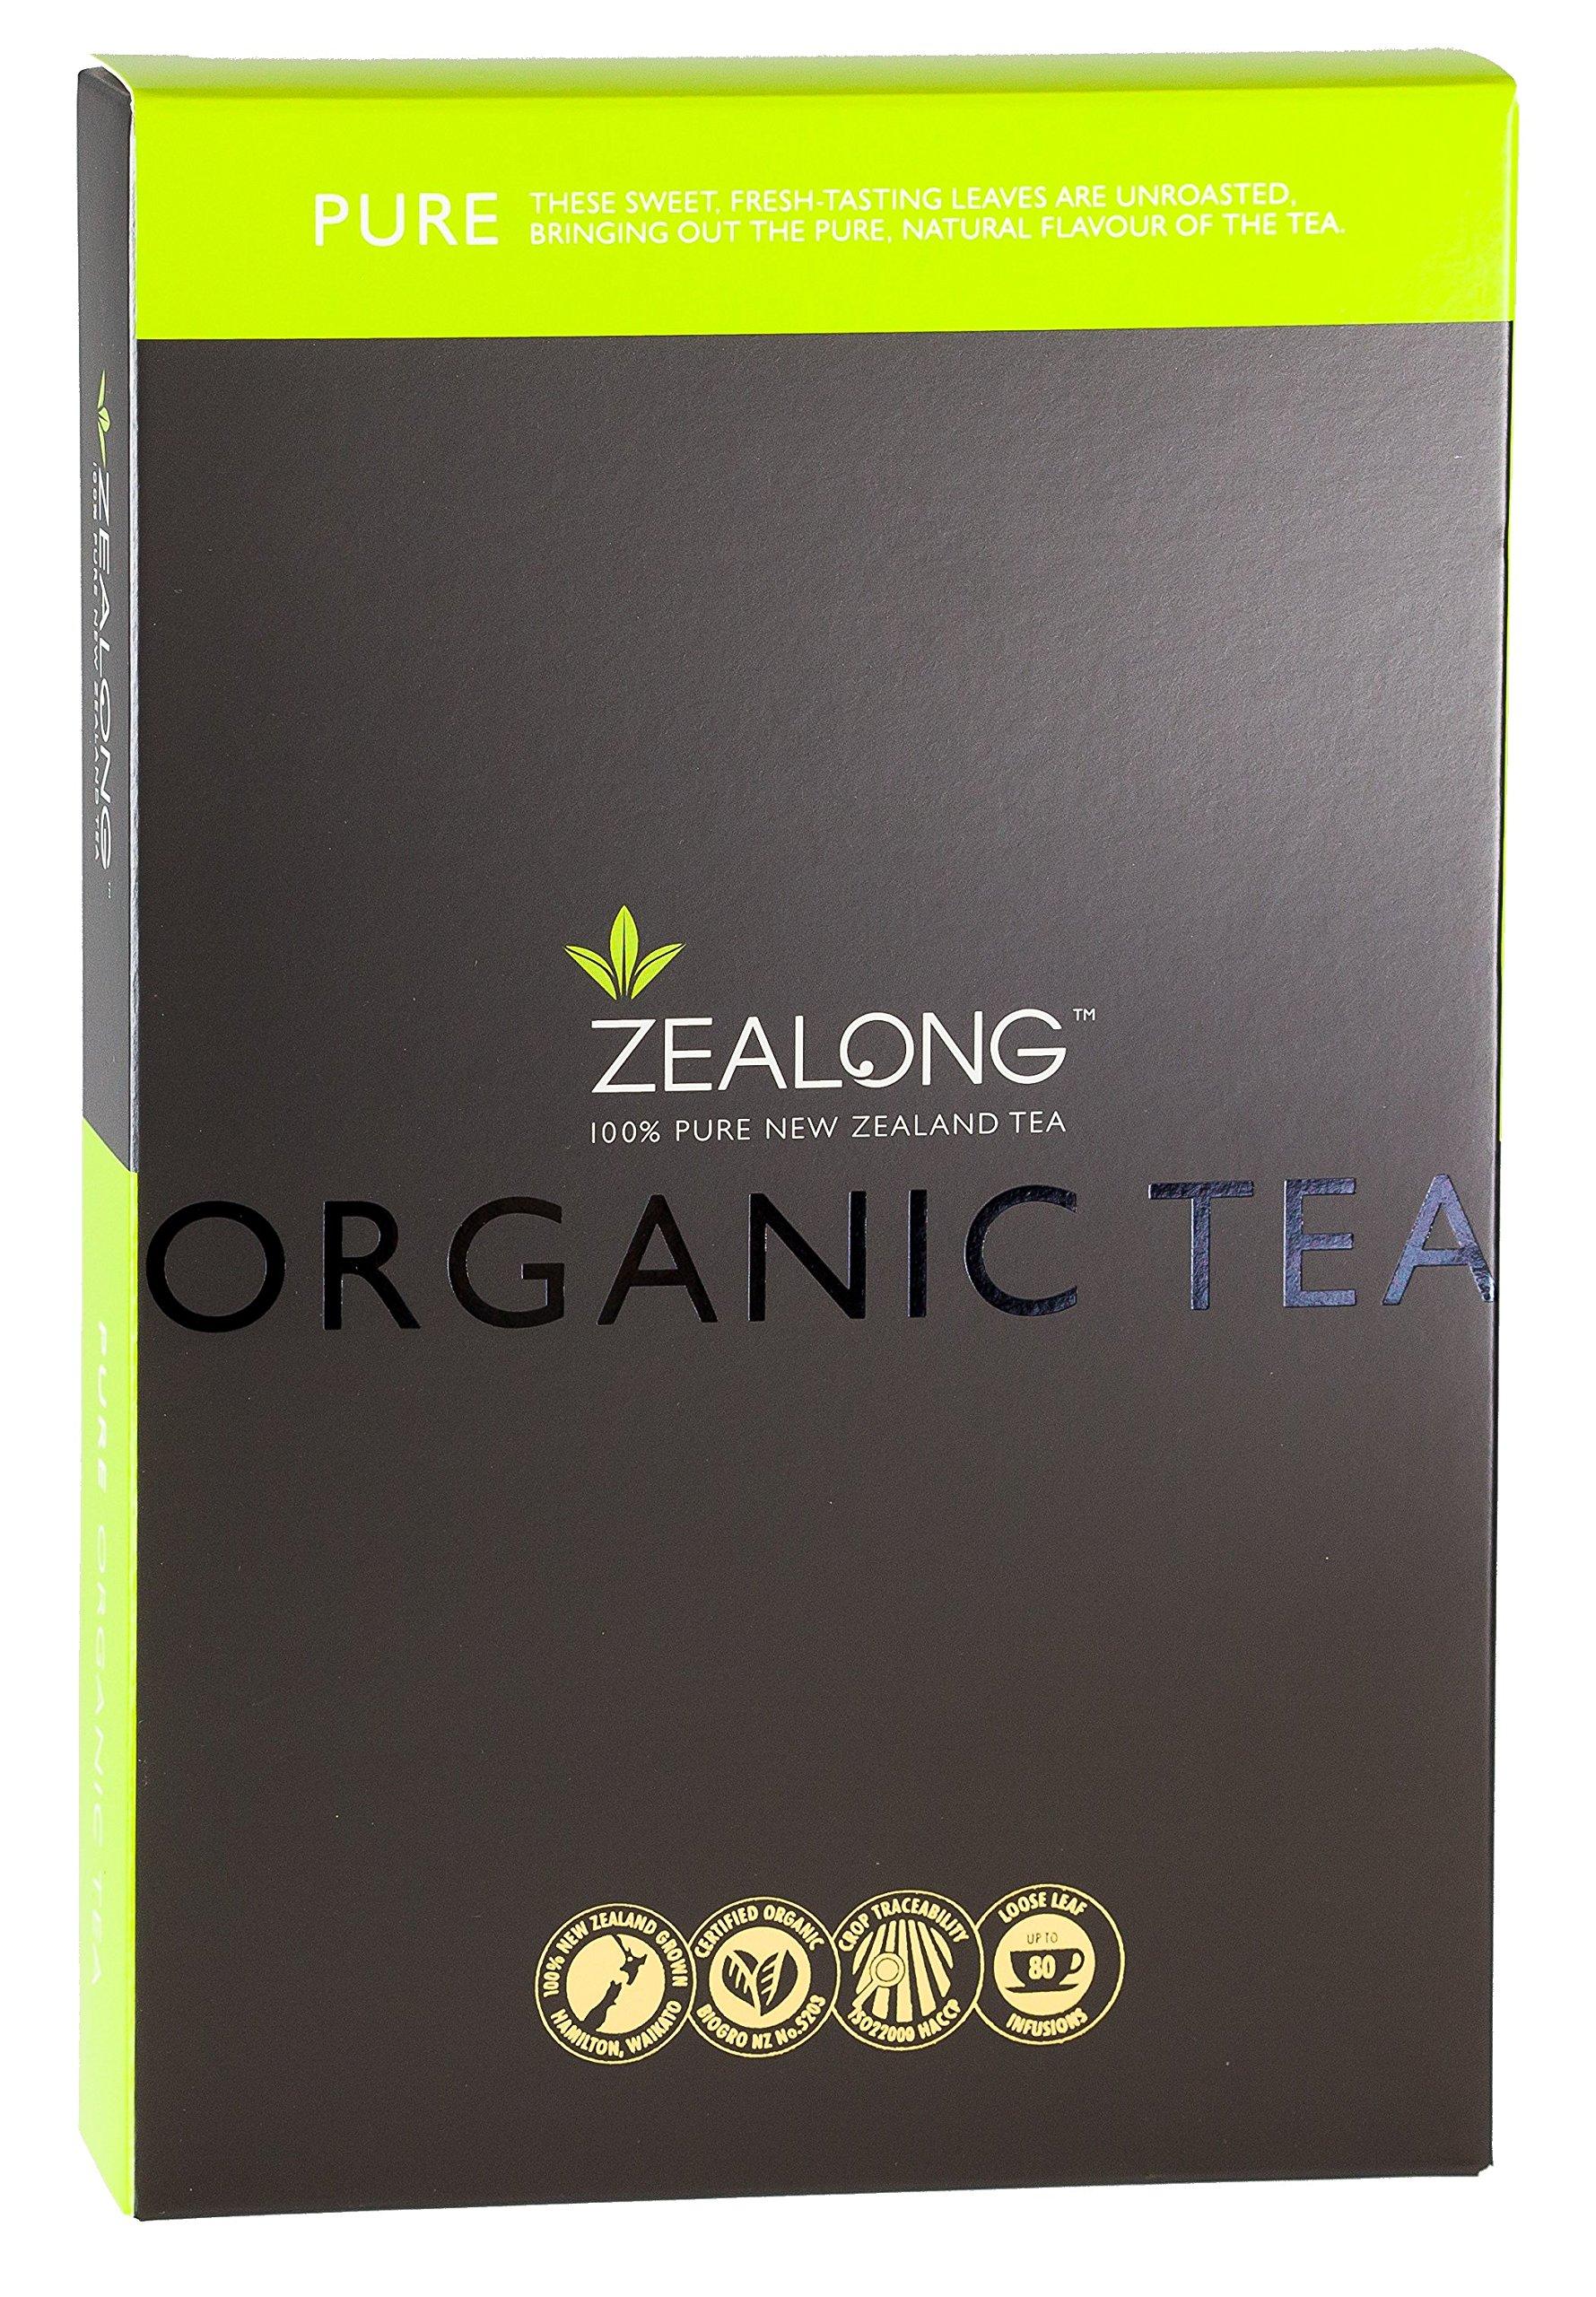 Organic Tea Pure Oolong Loose Leaf Tea Leaves by Zealong, Creators of The World's Purest Tea by Zealong